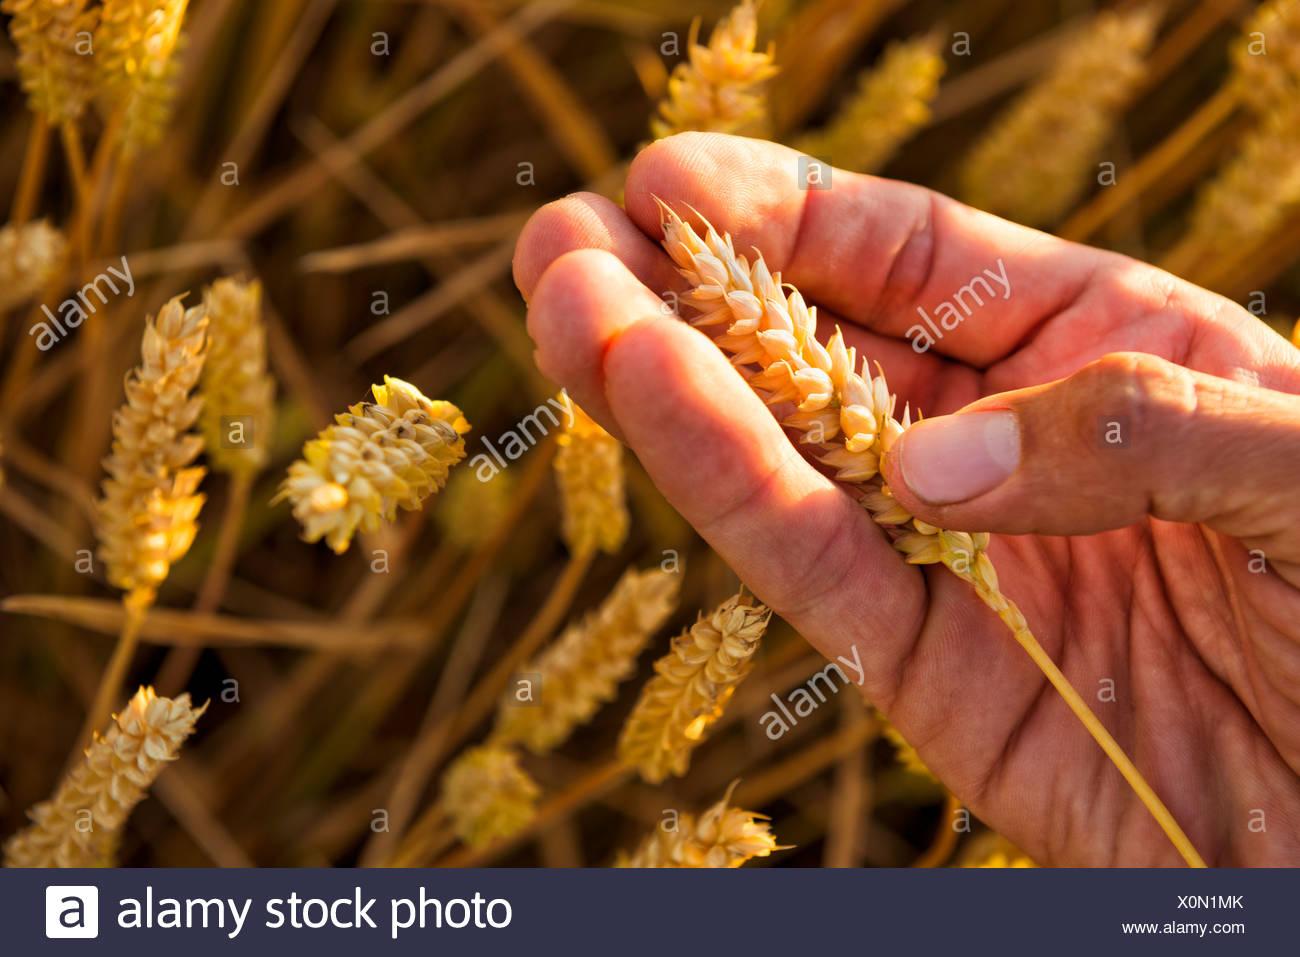 Hand holding ripe wheat, close-up - Stock Image